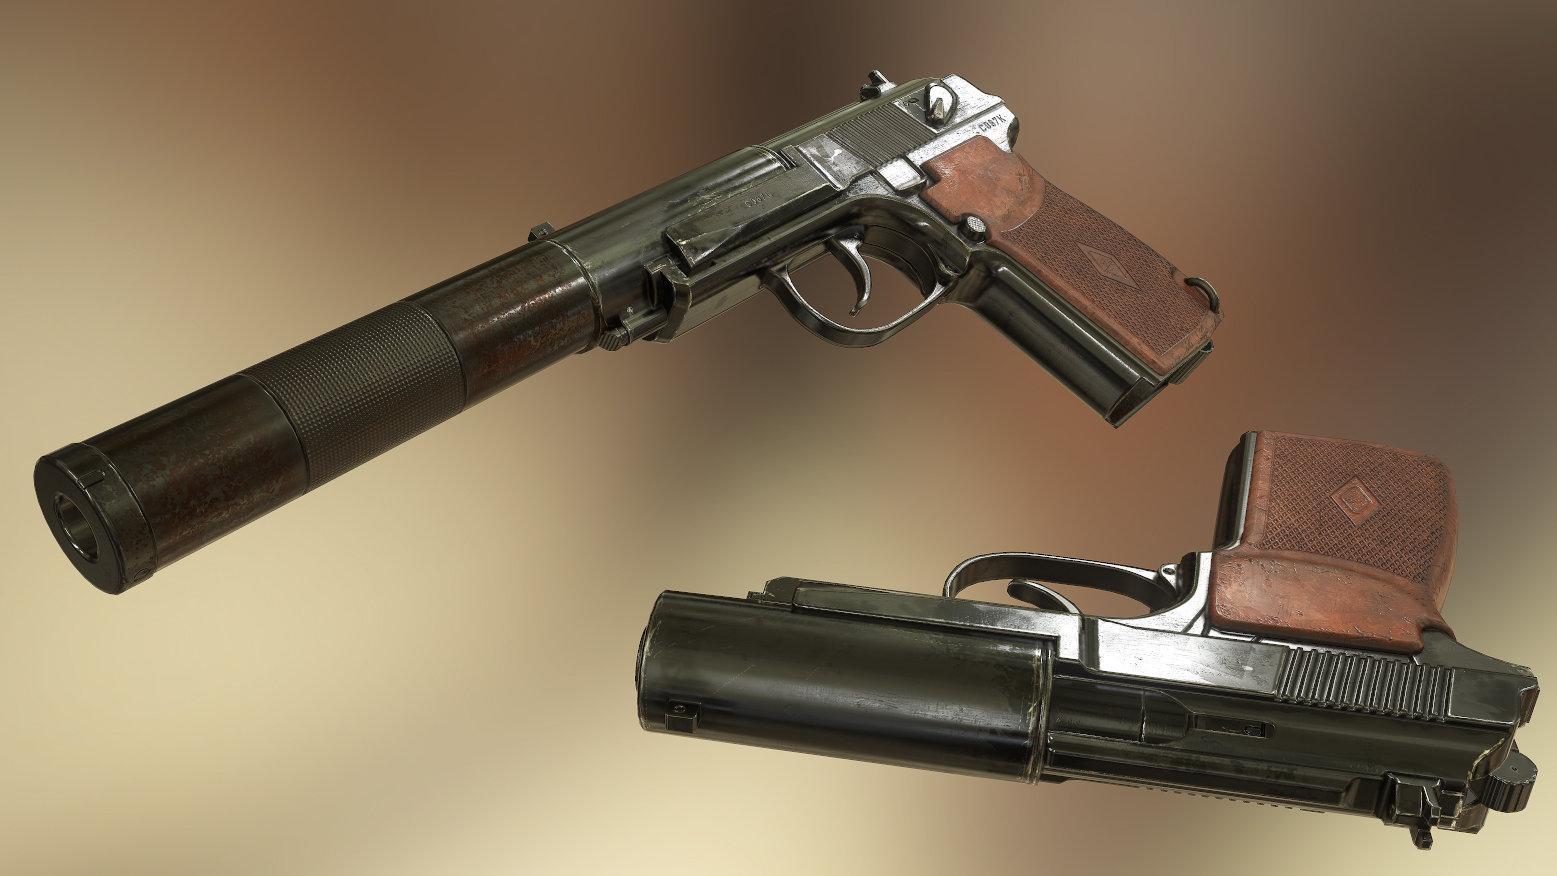 Asset - PB6P9 Pistol